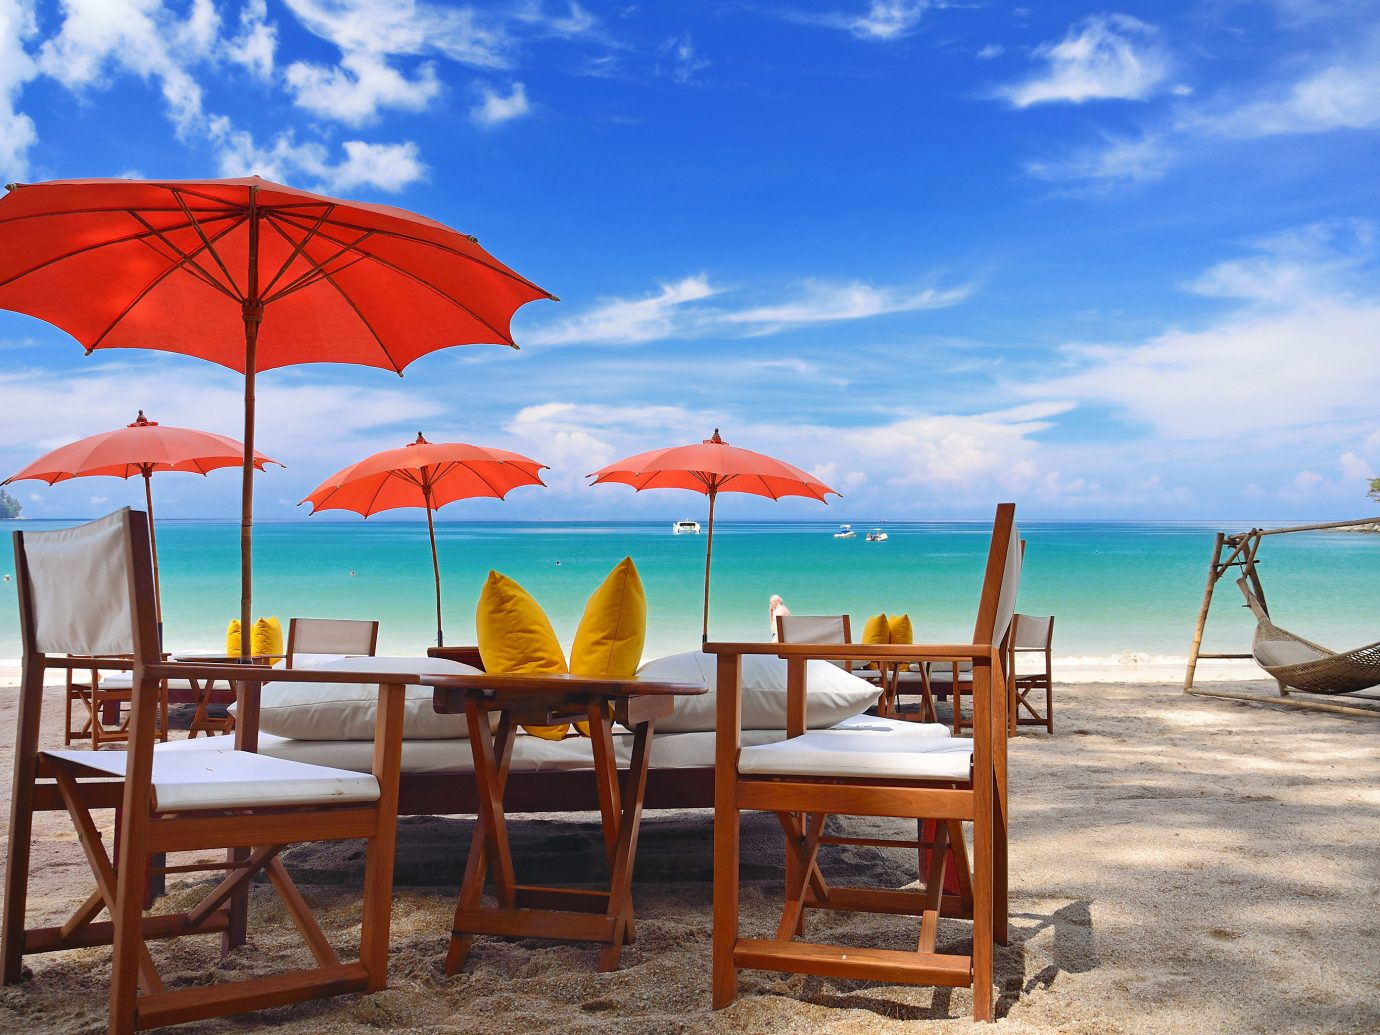 Beach Beachfront Hotels Lounge Ocean Outdoors Romance Tropical accessory sky umbrella chair leisure outdoor Nature vacation rain caribbean Sea Resort shore estate day several